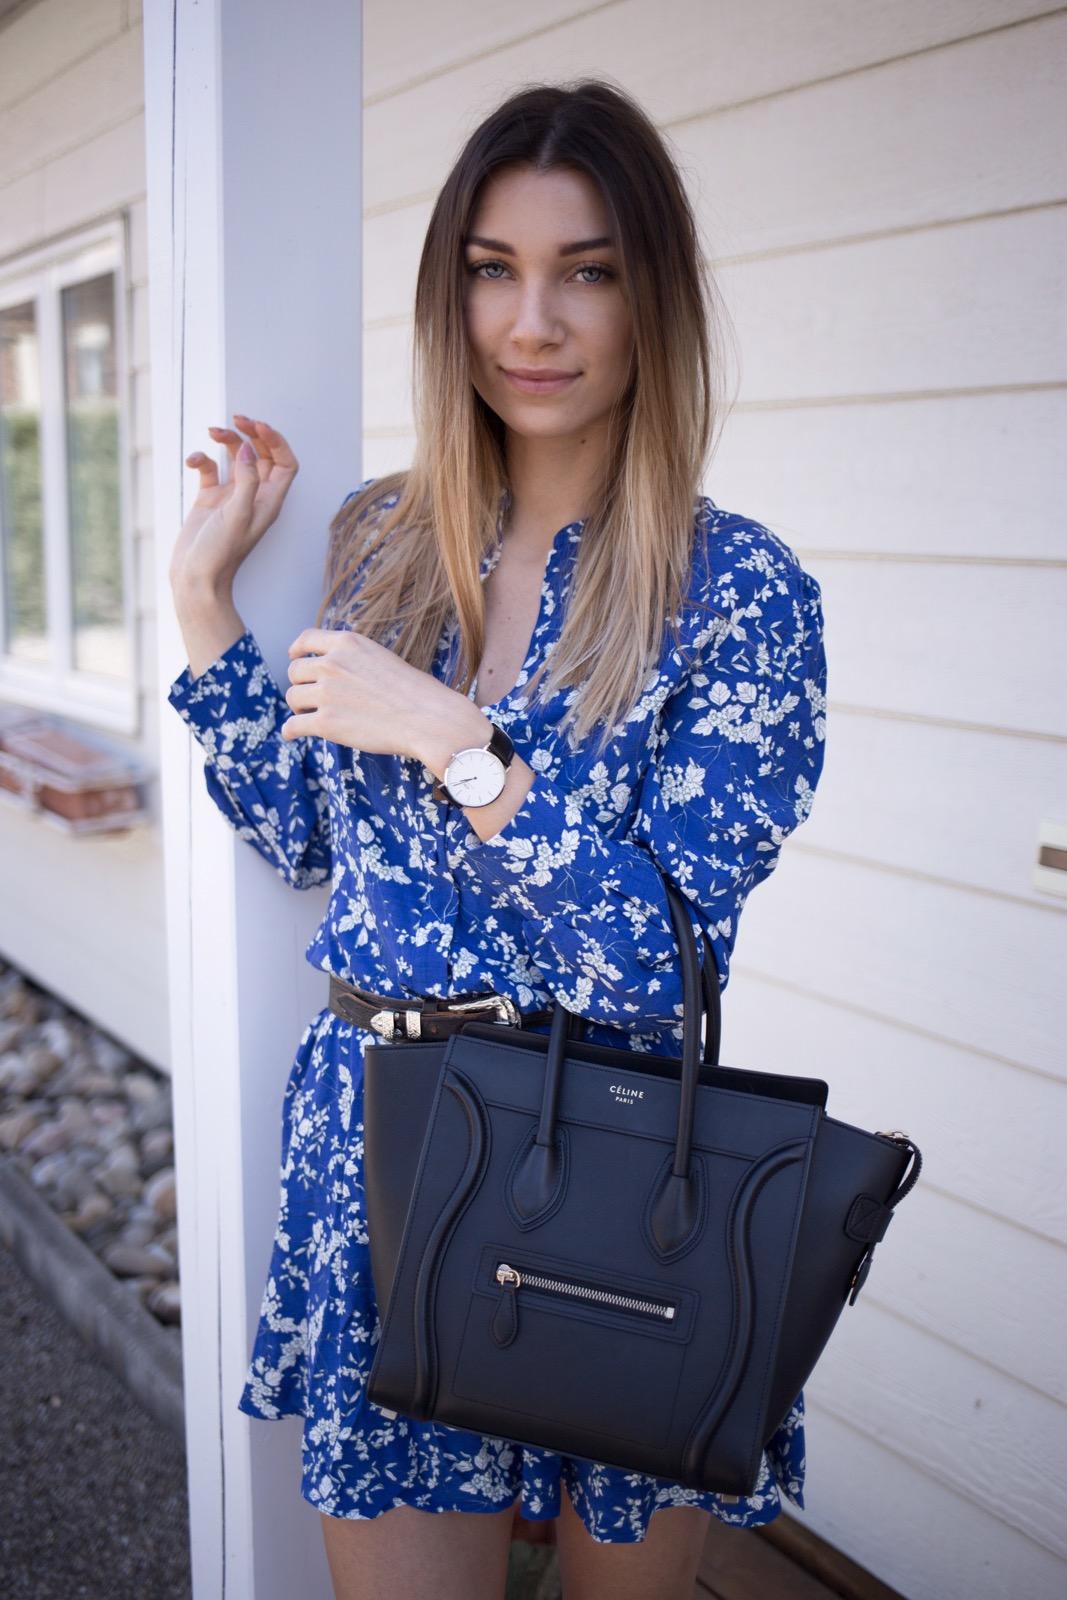 Maeva Dck, robe fleurie, robe printemps, robe h&m, blogueuse mode